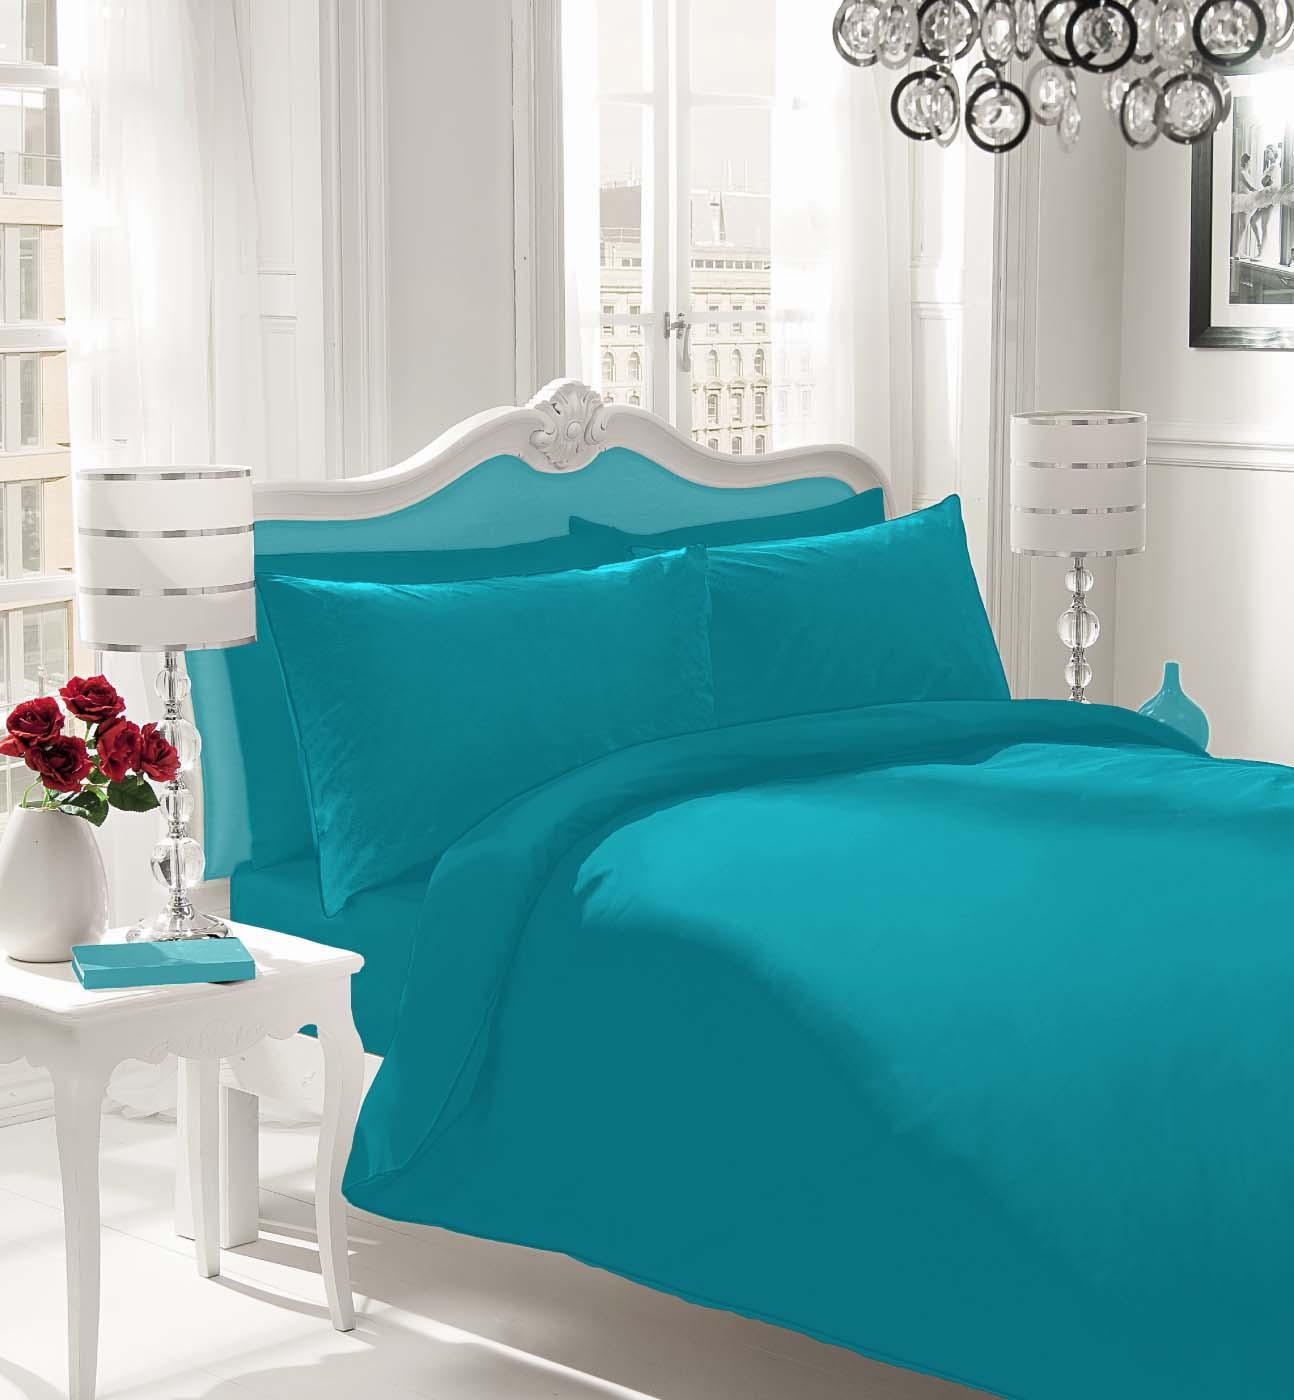 Gaveno Cavailia Non-Iron Percale Flat Sheet Polyester-Cotton Single - Teal